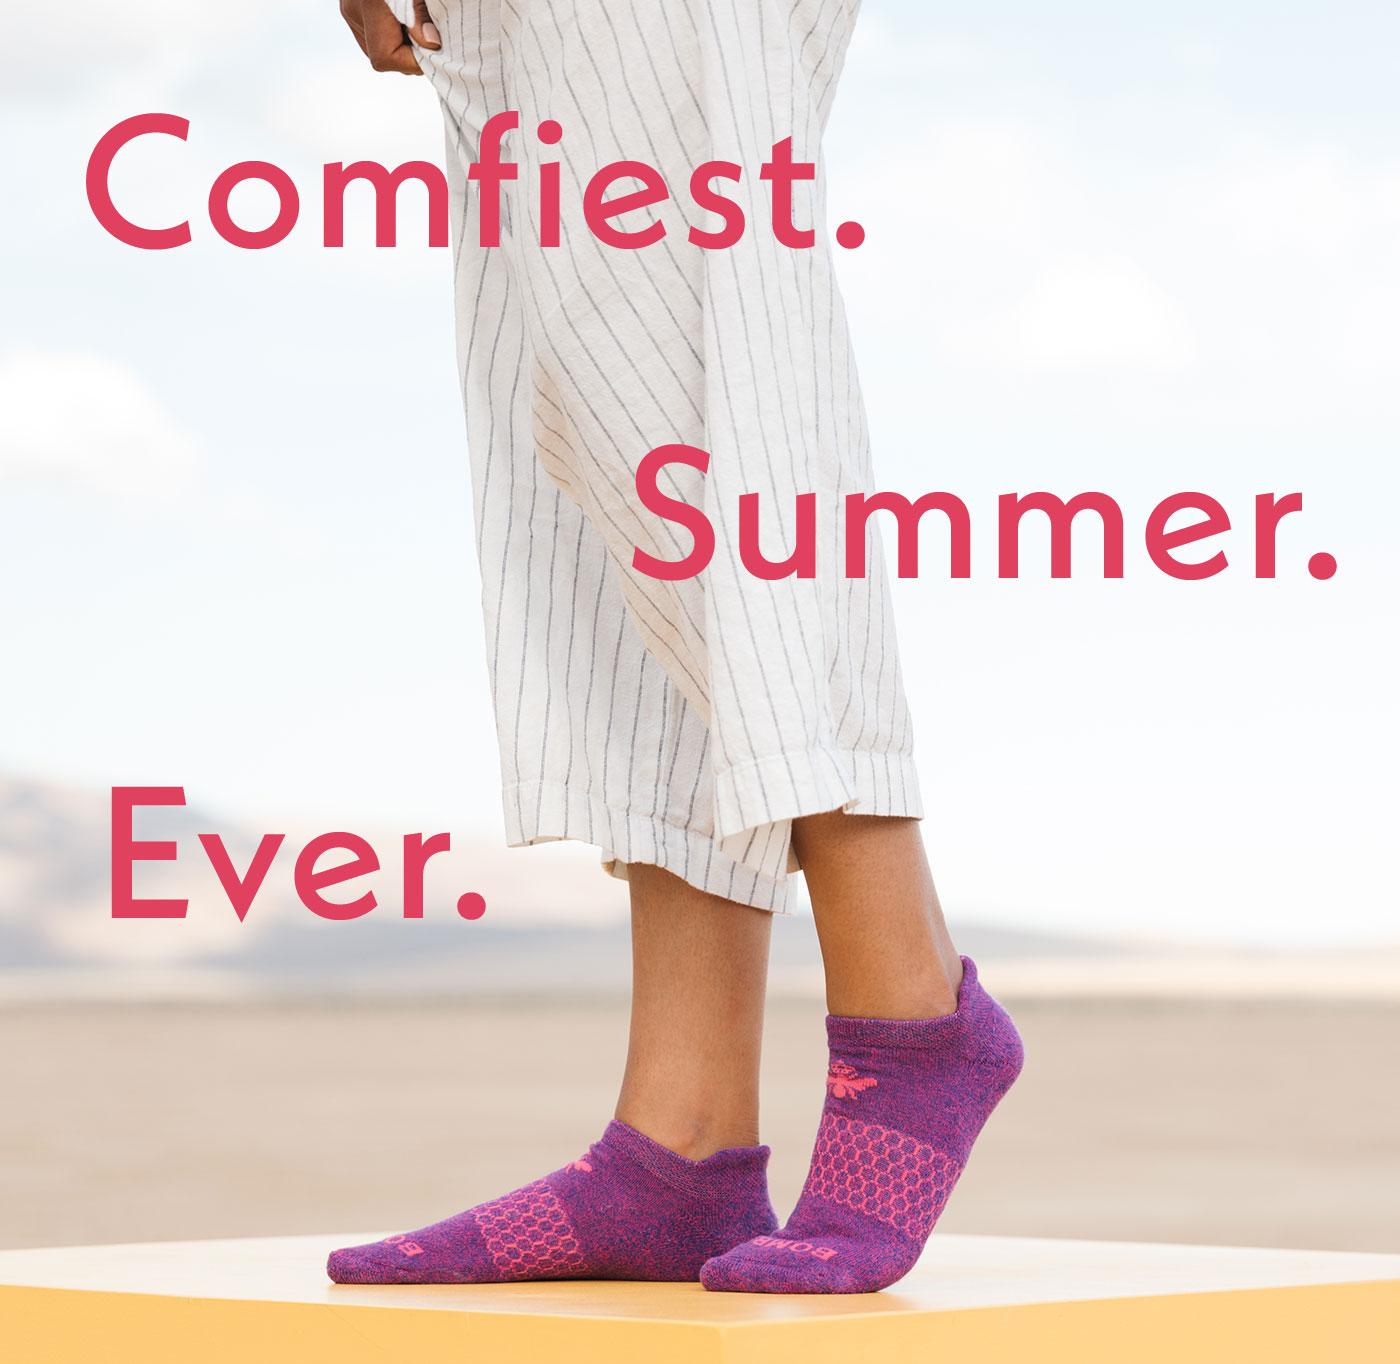 Comfiest. Summer. Ever.